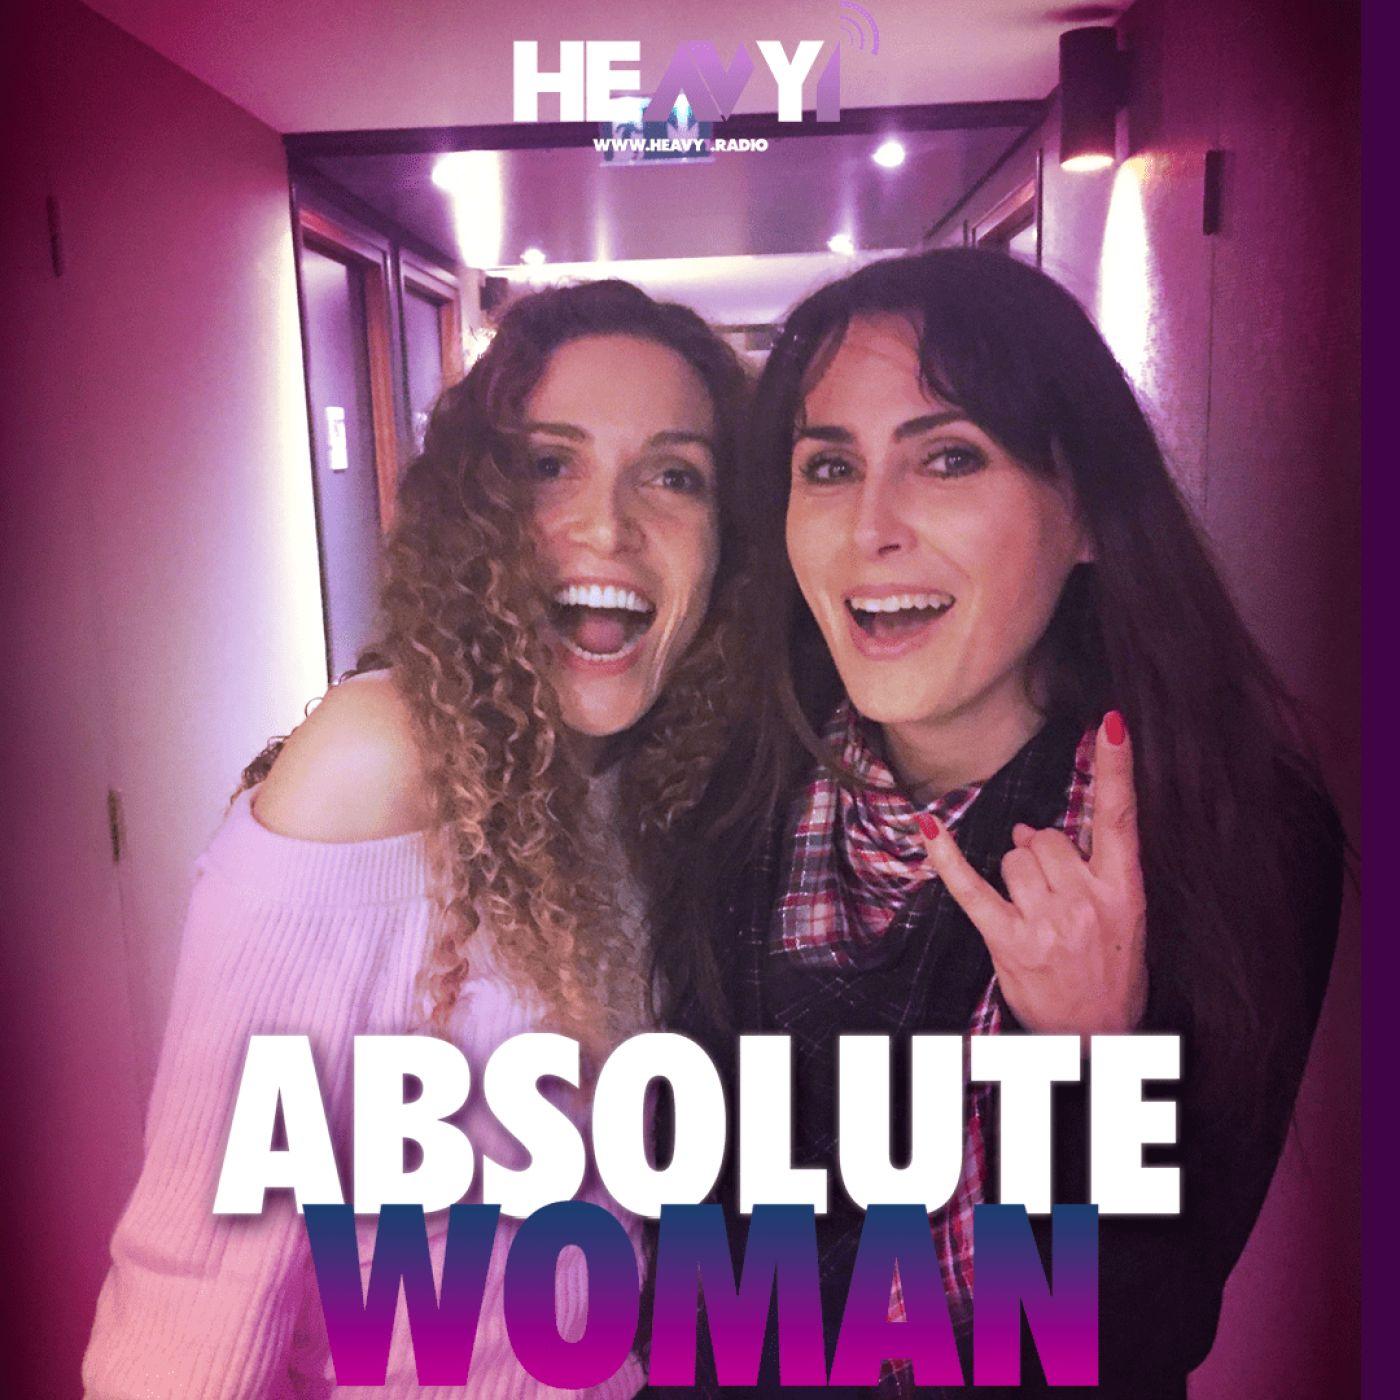 Absolute Woman : Sharon den Adel • Within Temptation (Ep.5 Saison 2)